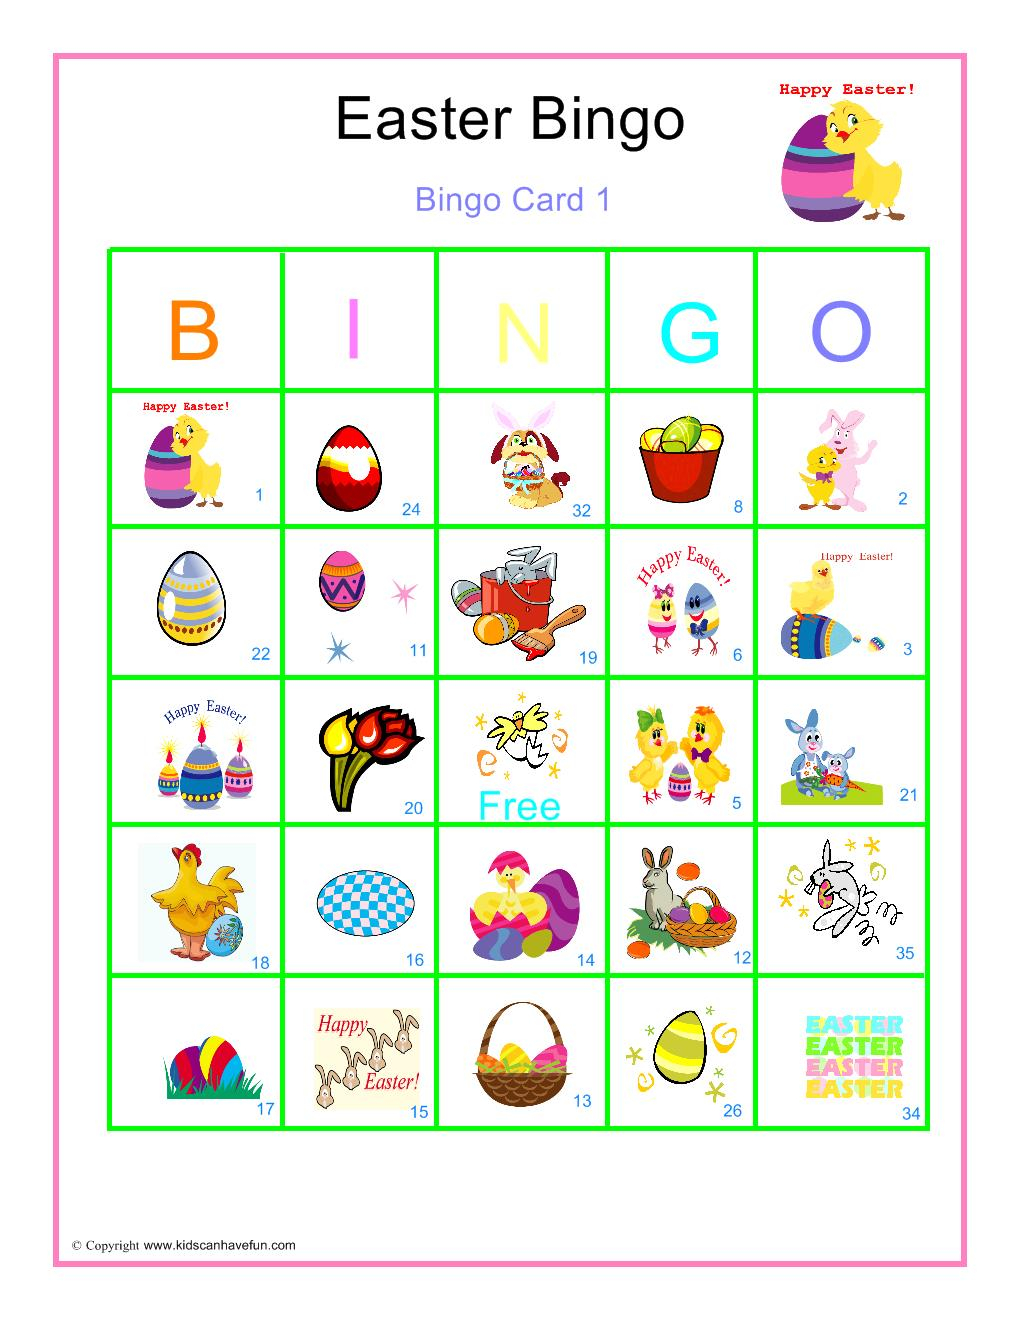 Free Printable Easter Bingo Game – Hd Easter Images - Free Printable Religious Easter Bingo Cards